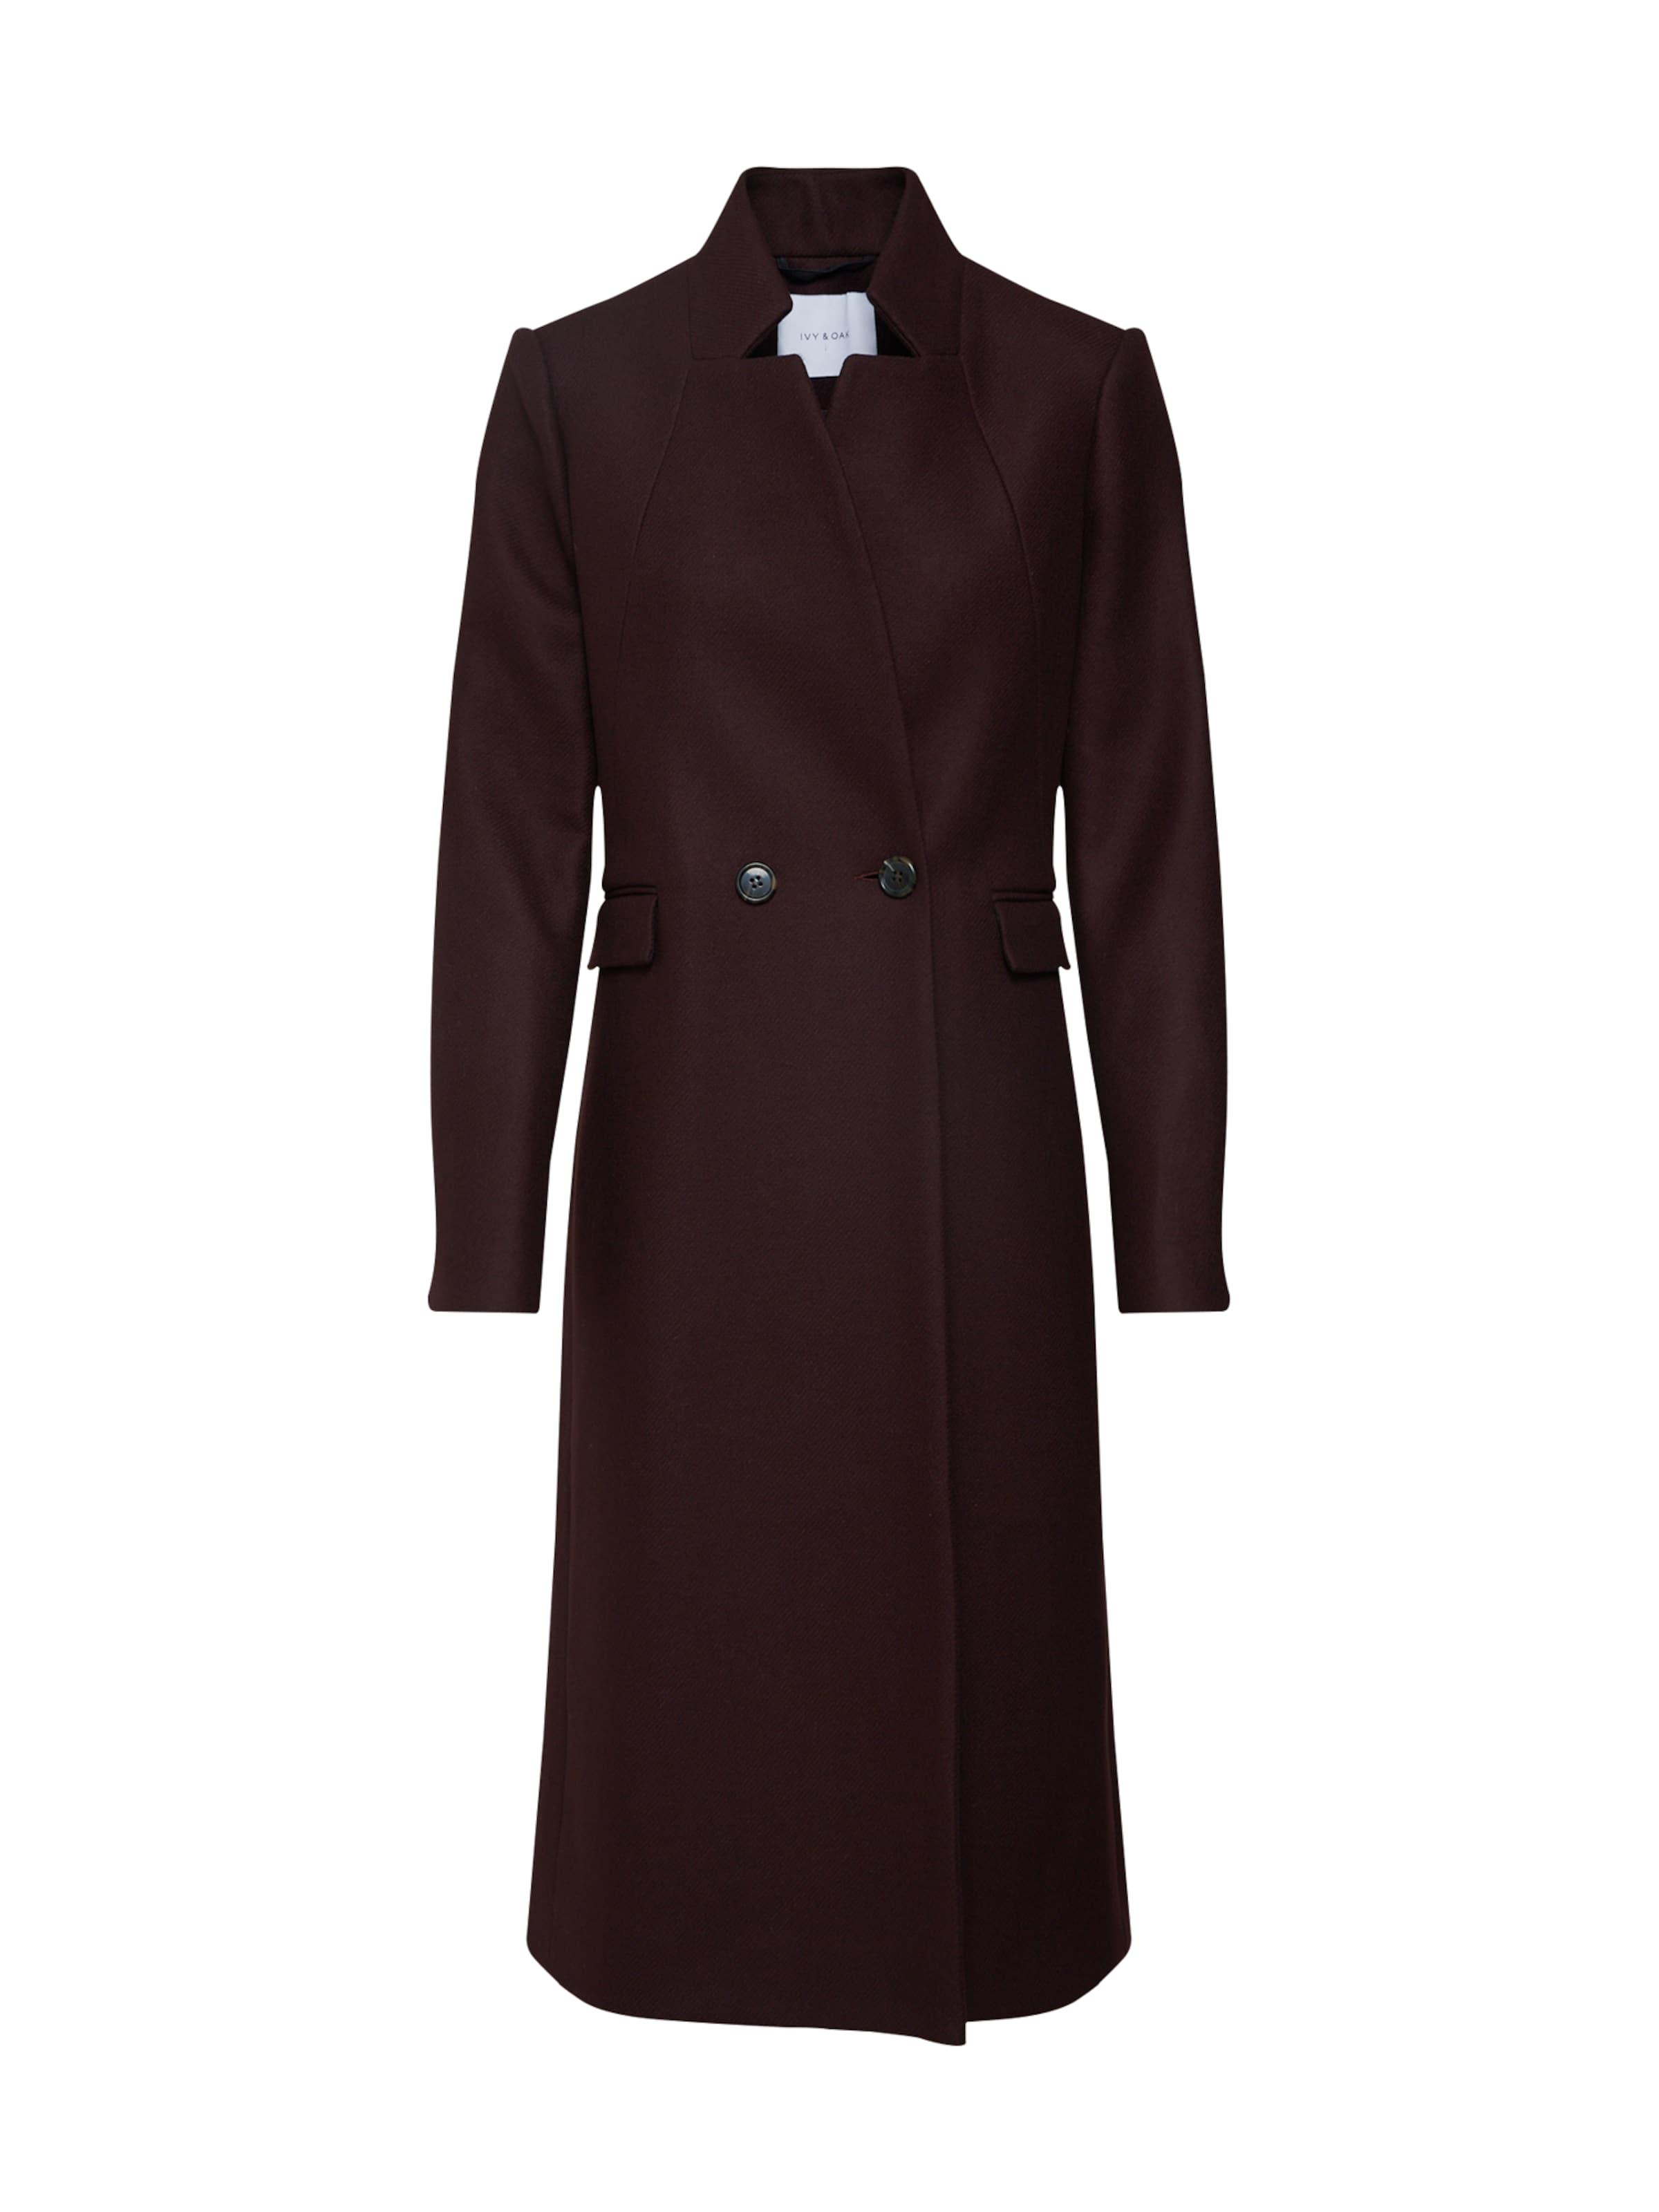 Mi 'blazer Oak Manteau Ivyamp; En Aubergine Coat' saison Yb76vmyIfg